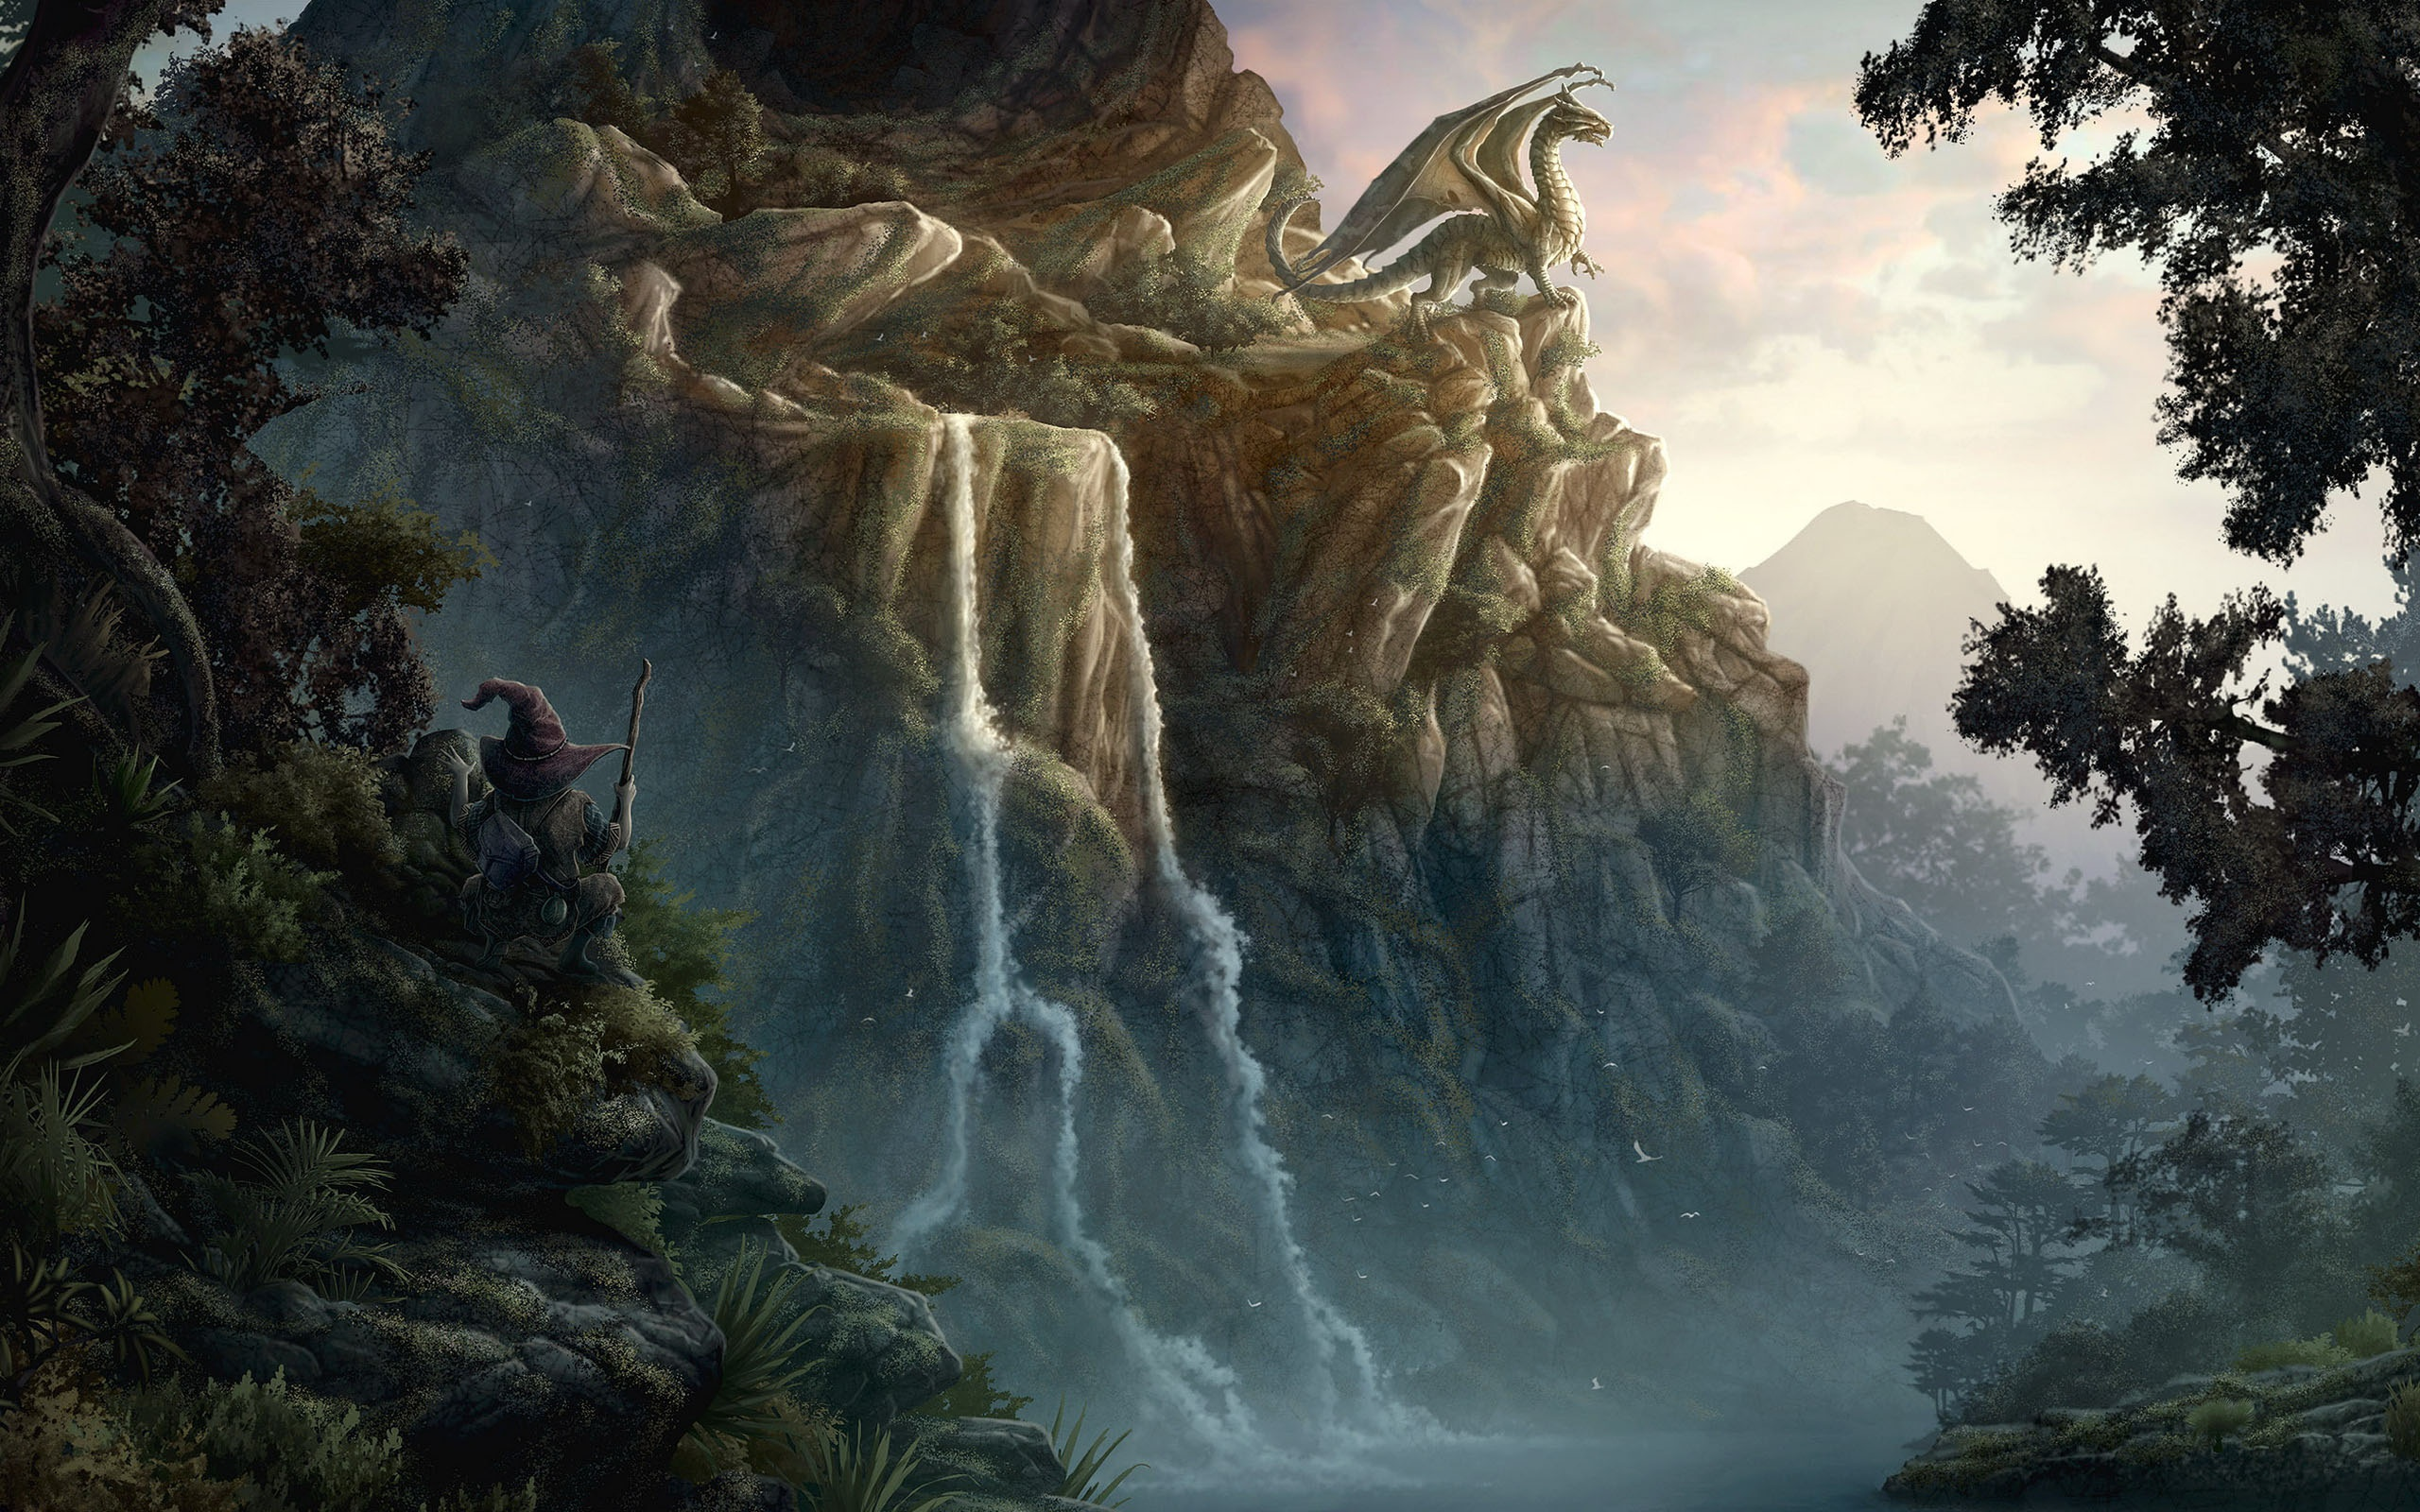 Fantasy Dragon 2560x1600